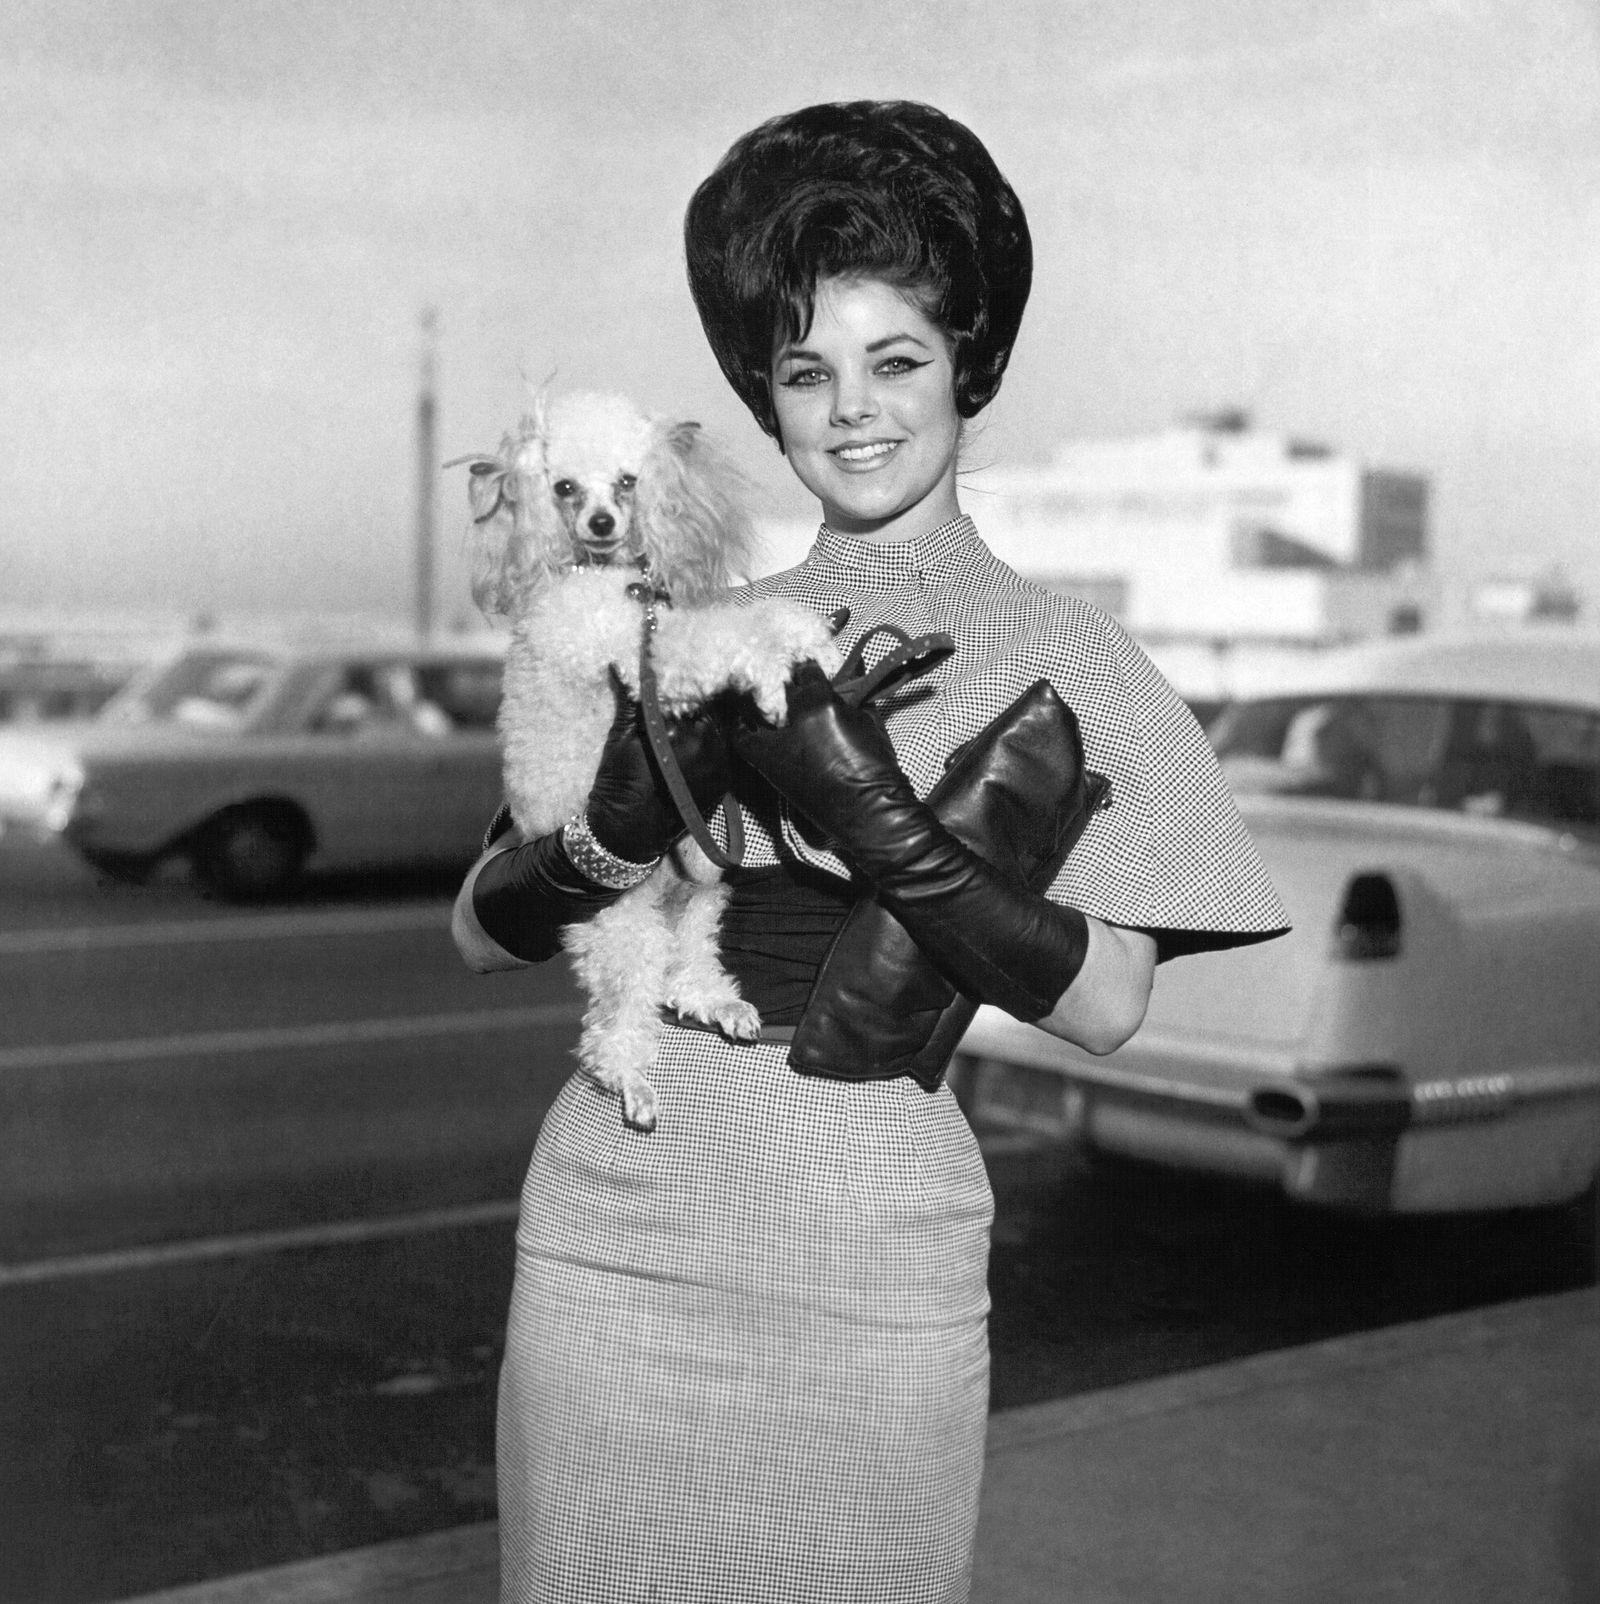 Rock and roll singer Elvis Presley's wife Priscilla Beaulieu Presley